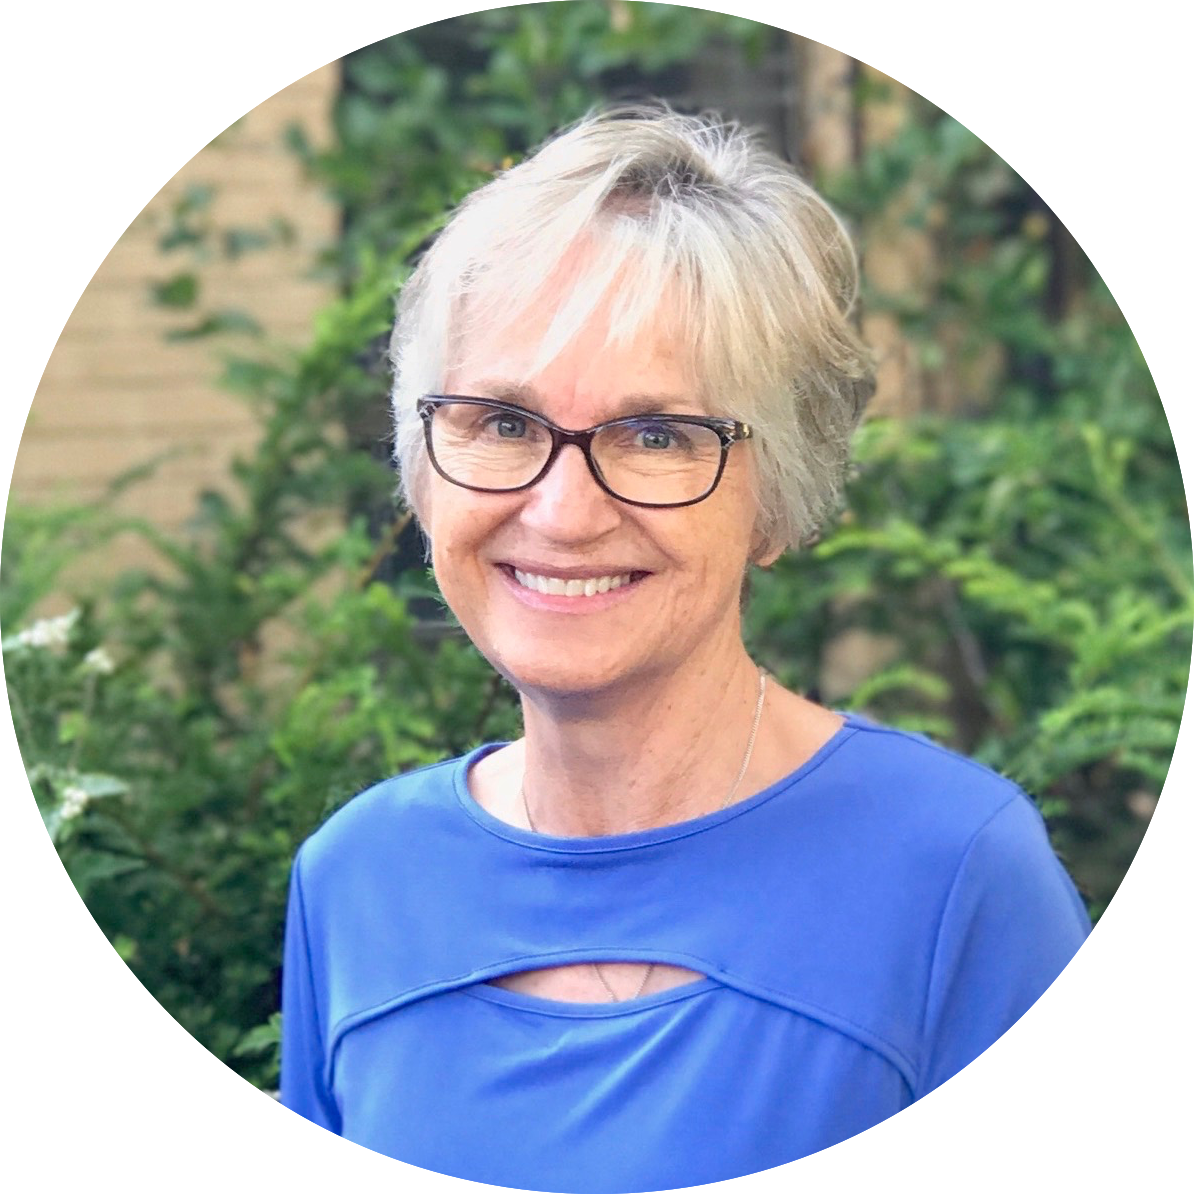 Bernadette Hensen - School Principal